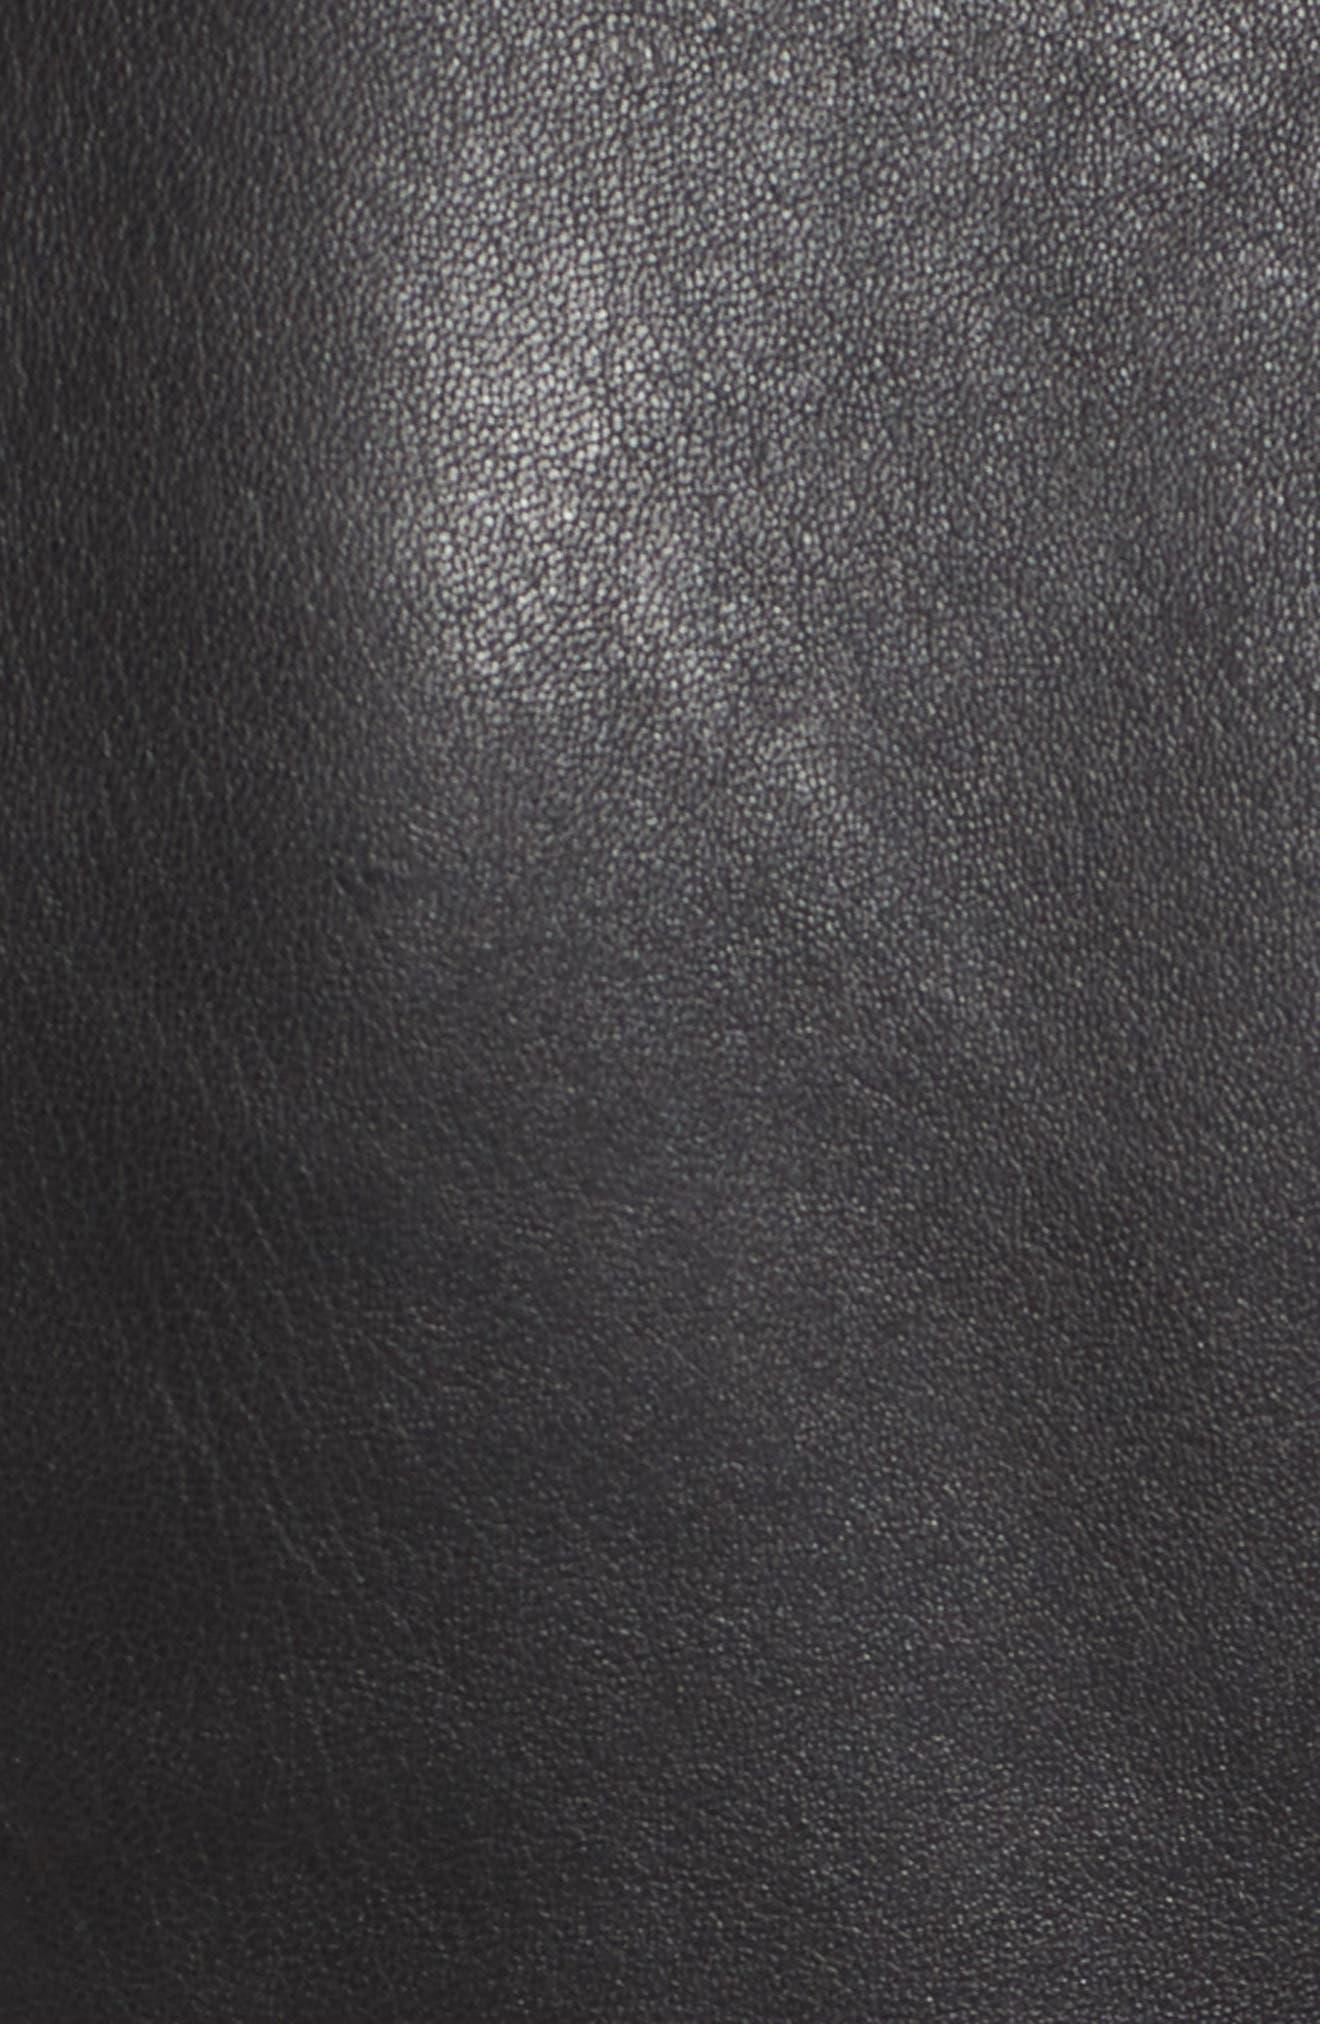 Highgrove Leather BIker Jacket,                             Alternate thumbnail 6, color,                             Black